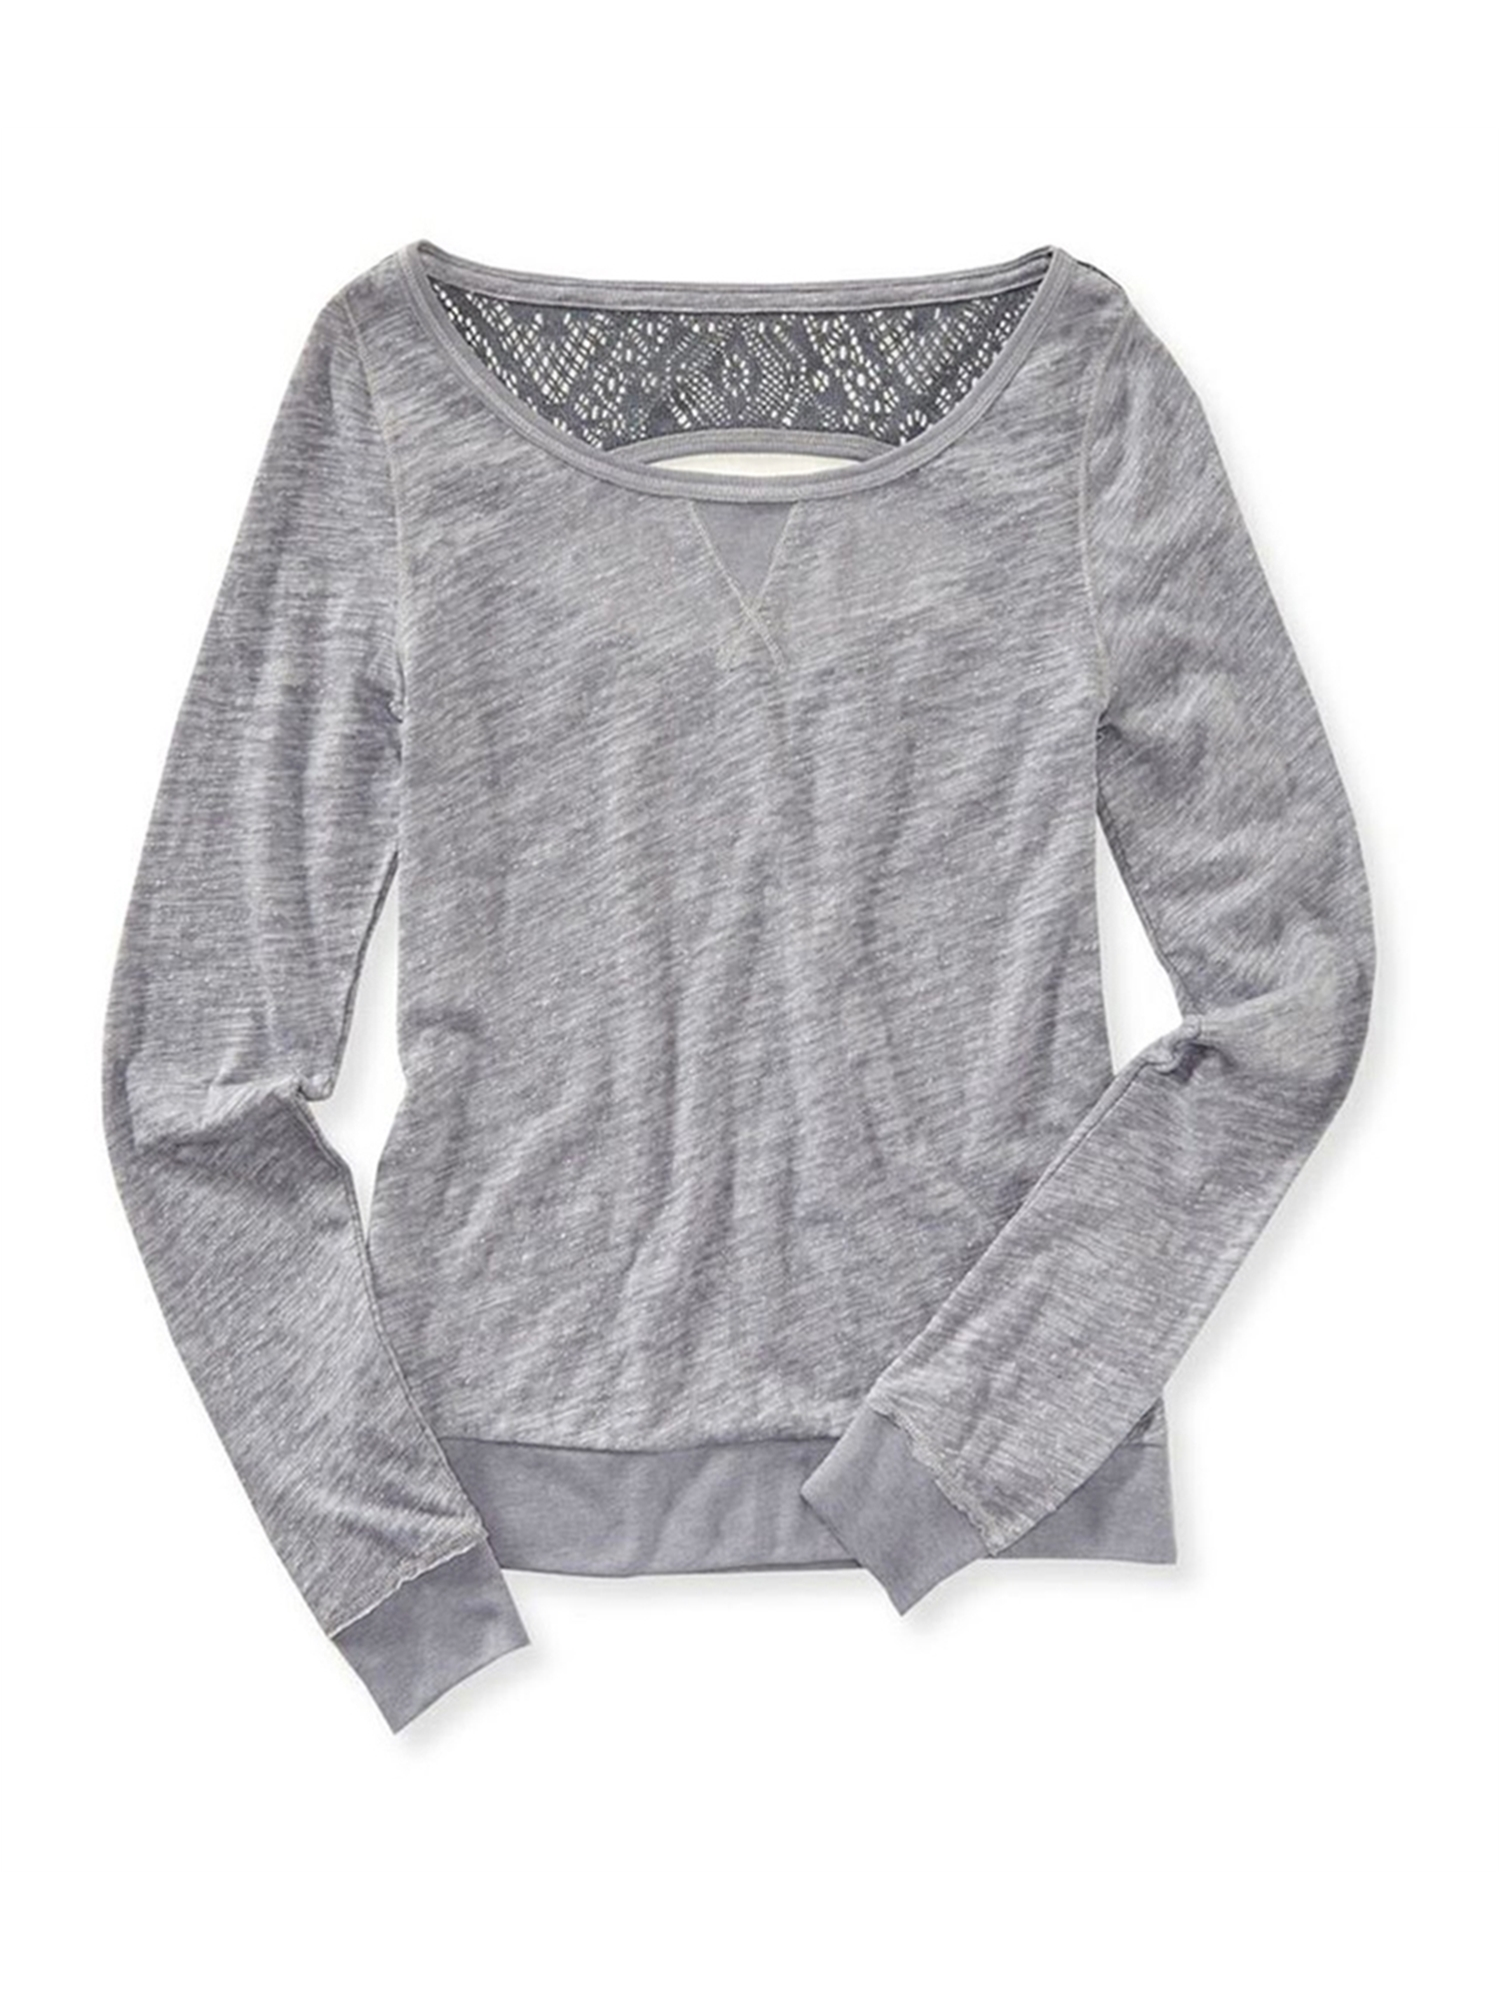 Aeropostale Womens Solid Ls Basic T-Shirt 017 XS Juniors